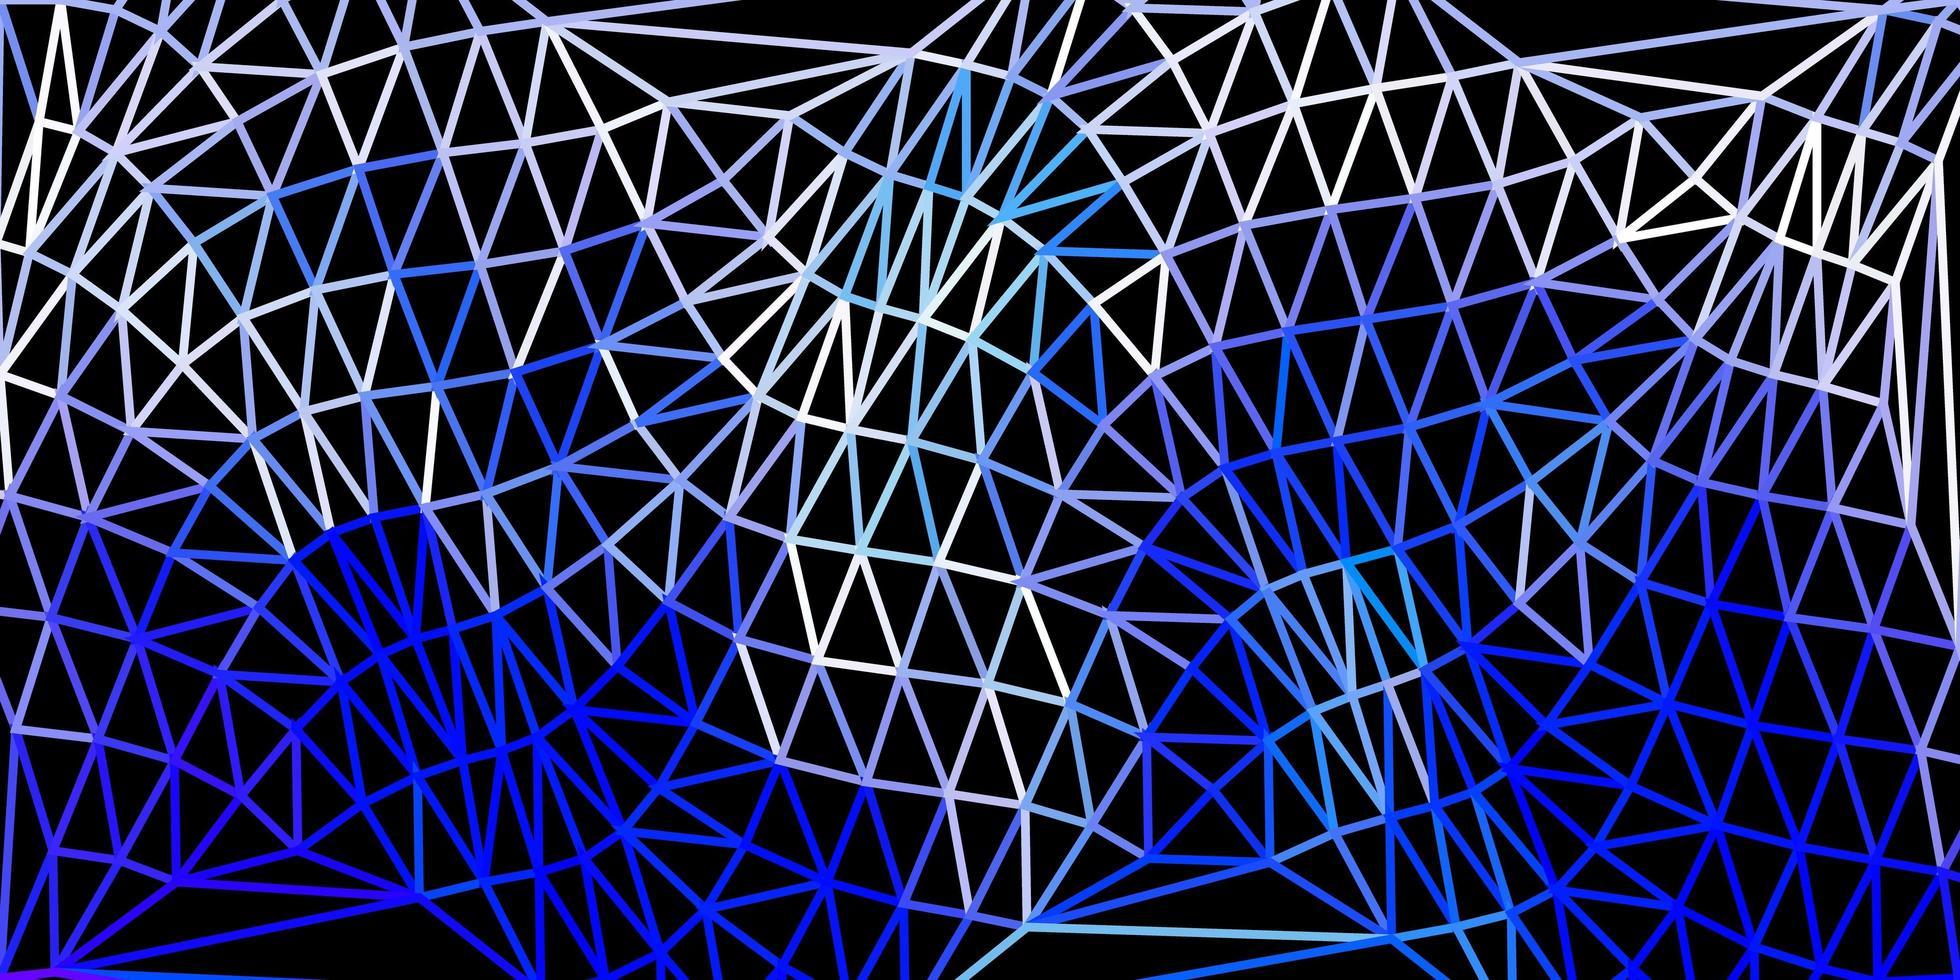 dunkelblaue Vektor-Gradienten-Polygon-Textur. vektor